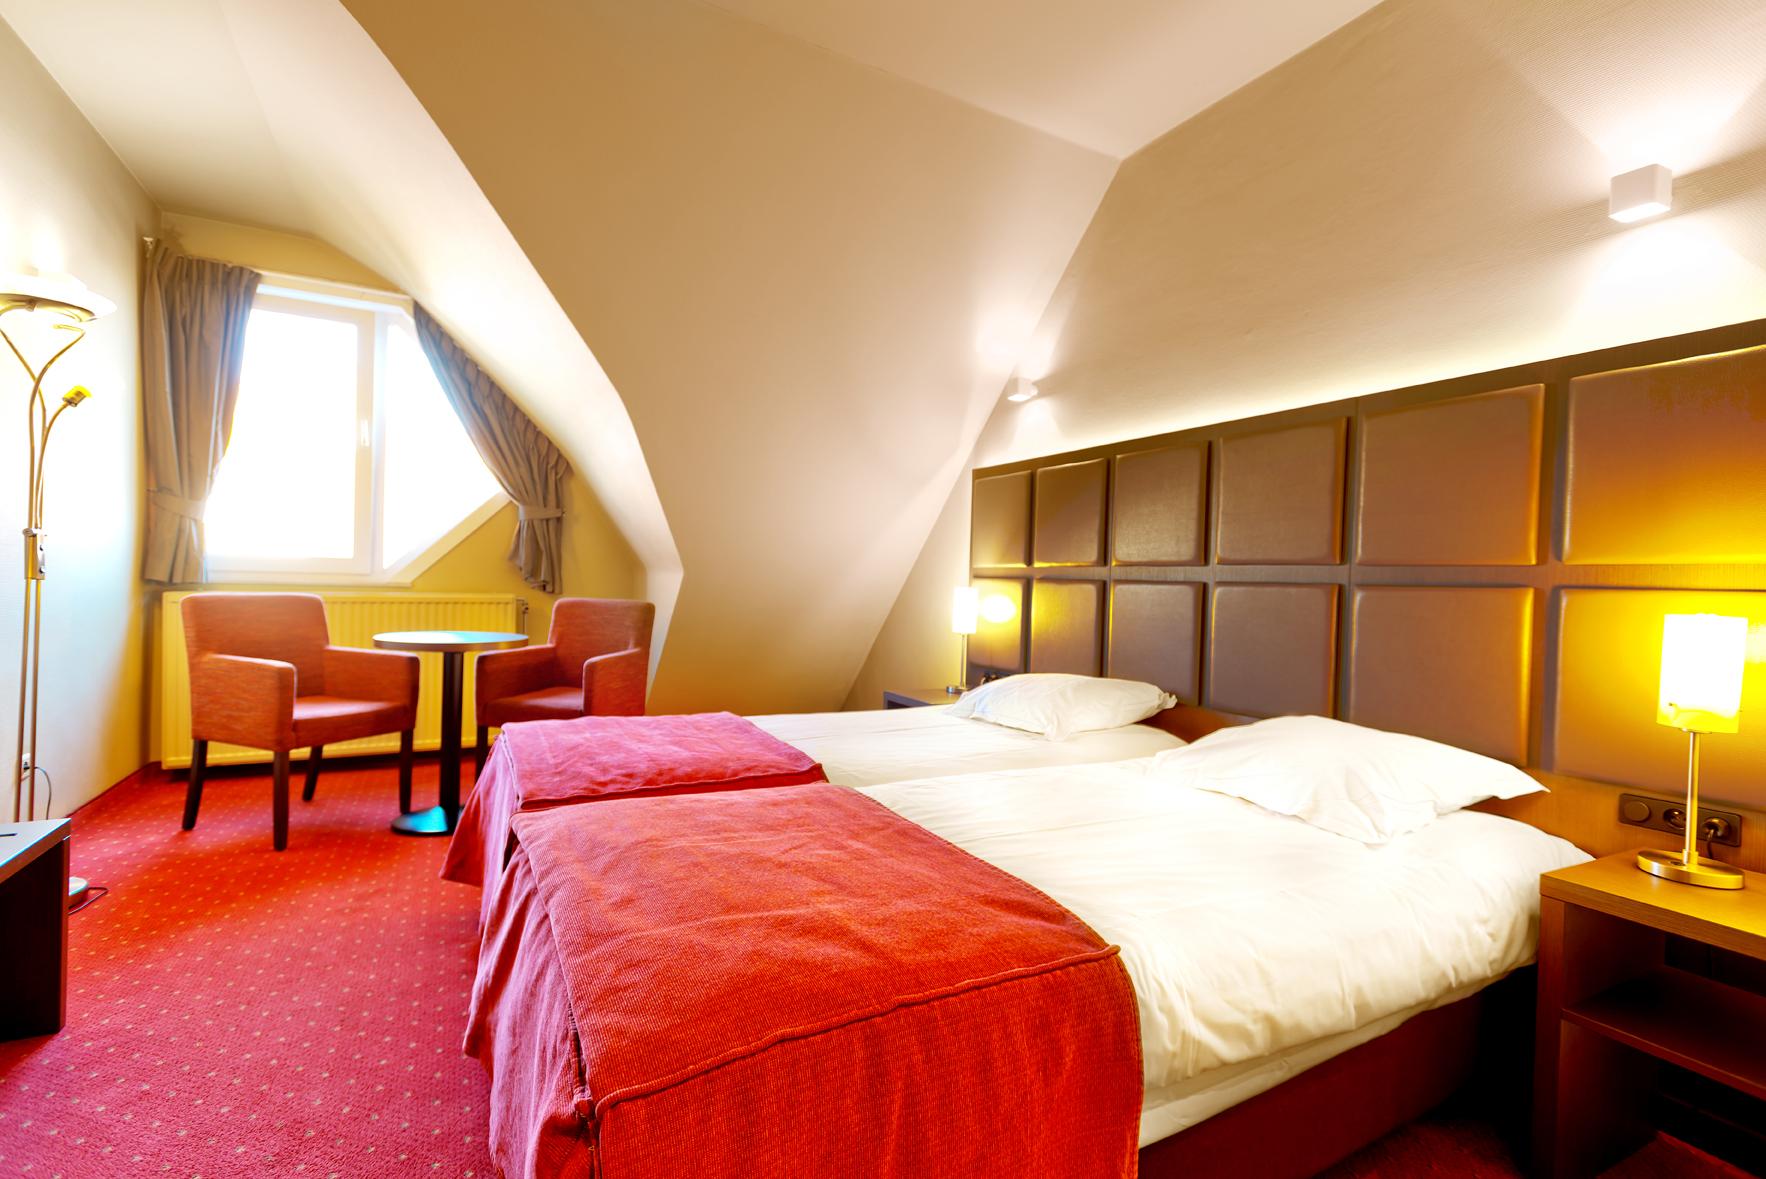 Adagio hotel online booking knokke heist for Reservation hotel adagio